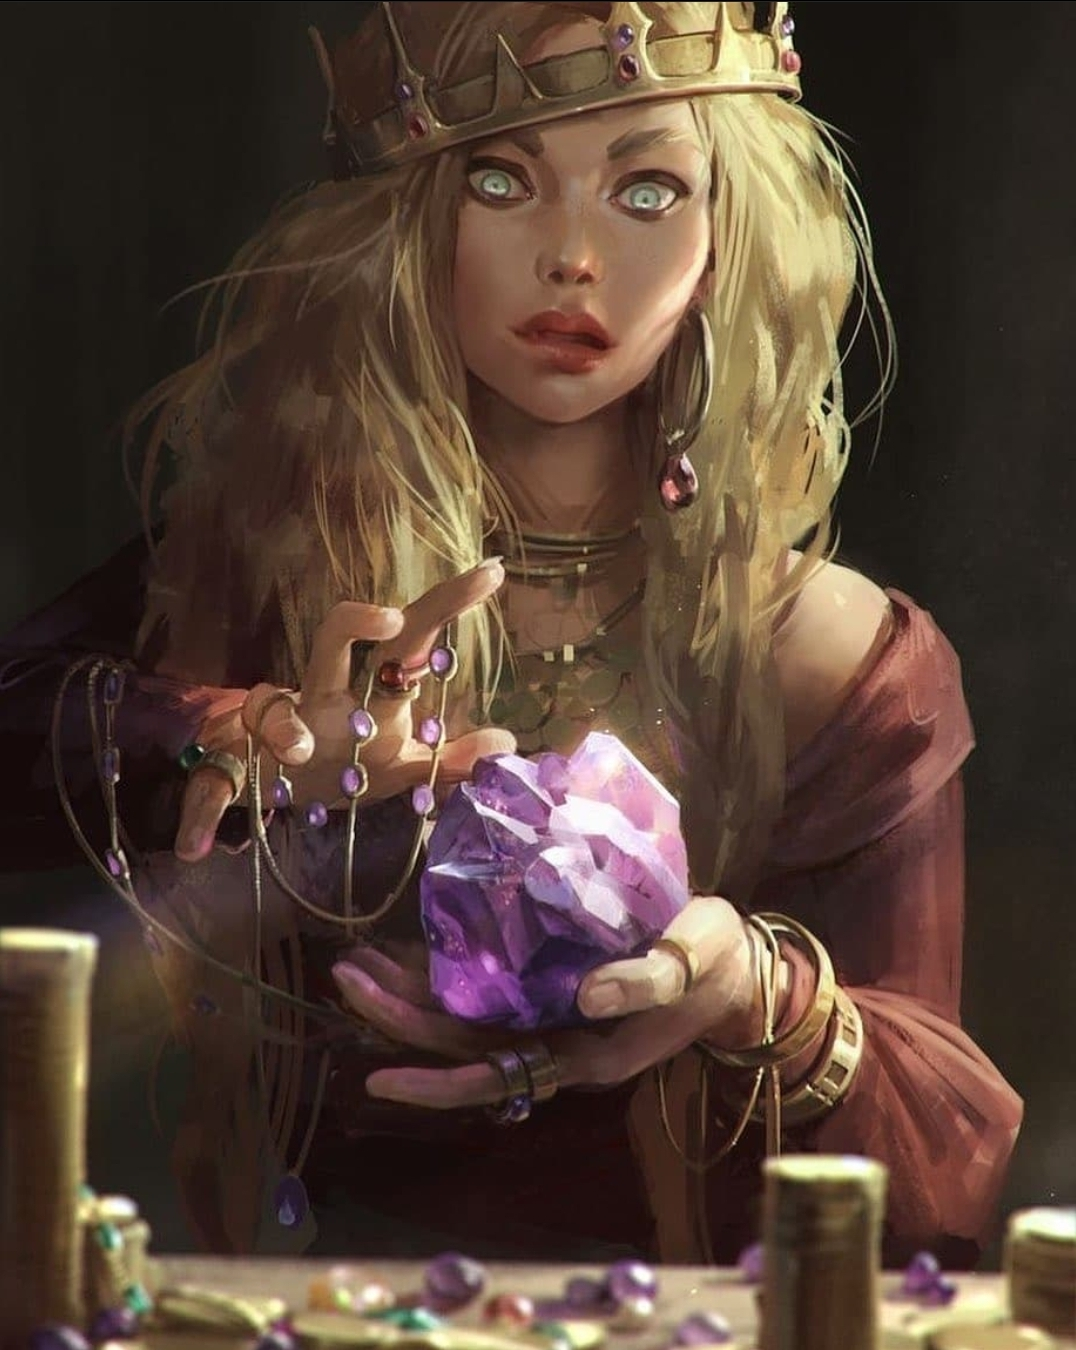 Enchanter, come to see. Enchanter, can you see?